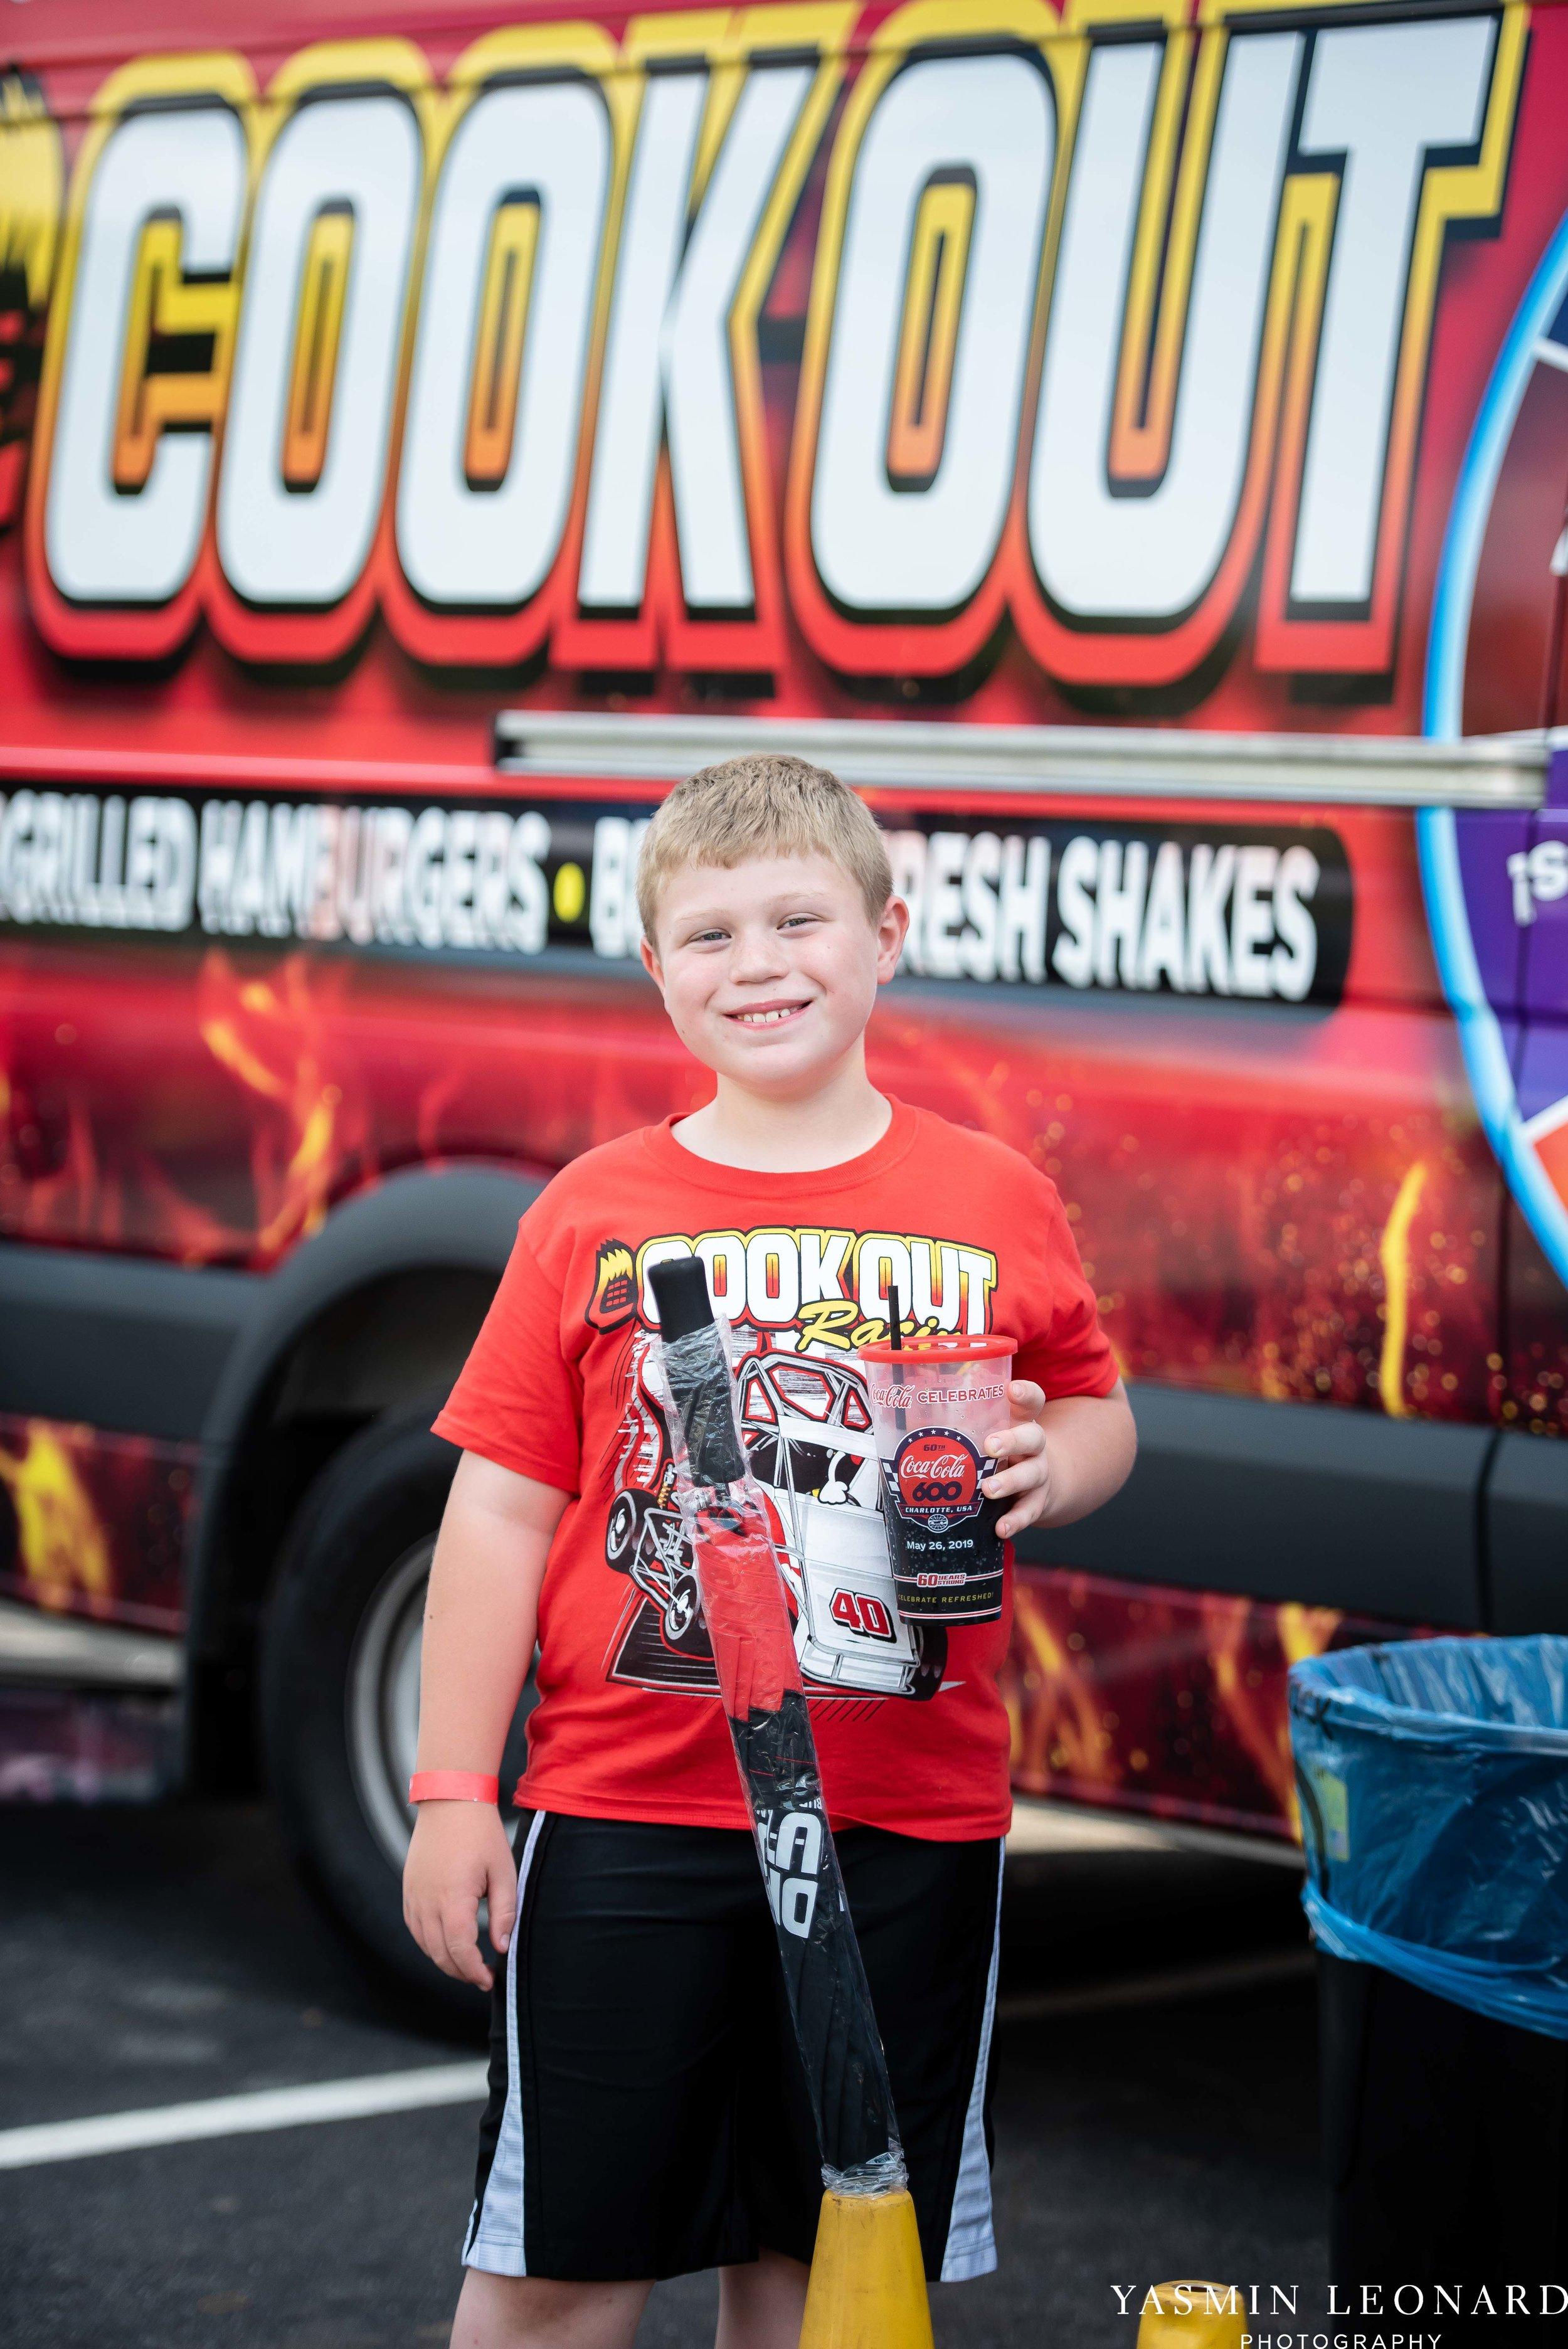 Cookout - CocaCola 600 - Coca Cola - Austin Dillon - Nascar - Nascar Meet and Greet - Yasmin Leonard Photography-21.jpg